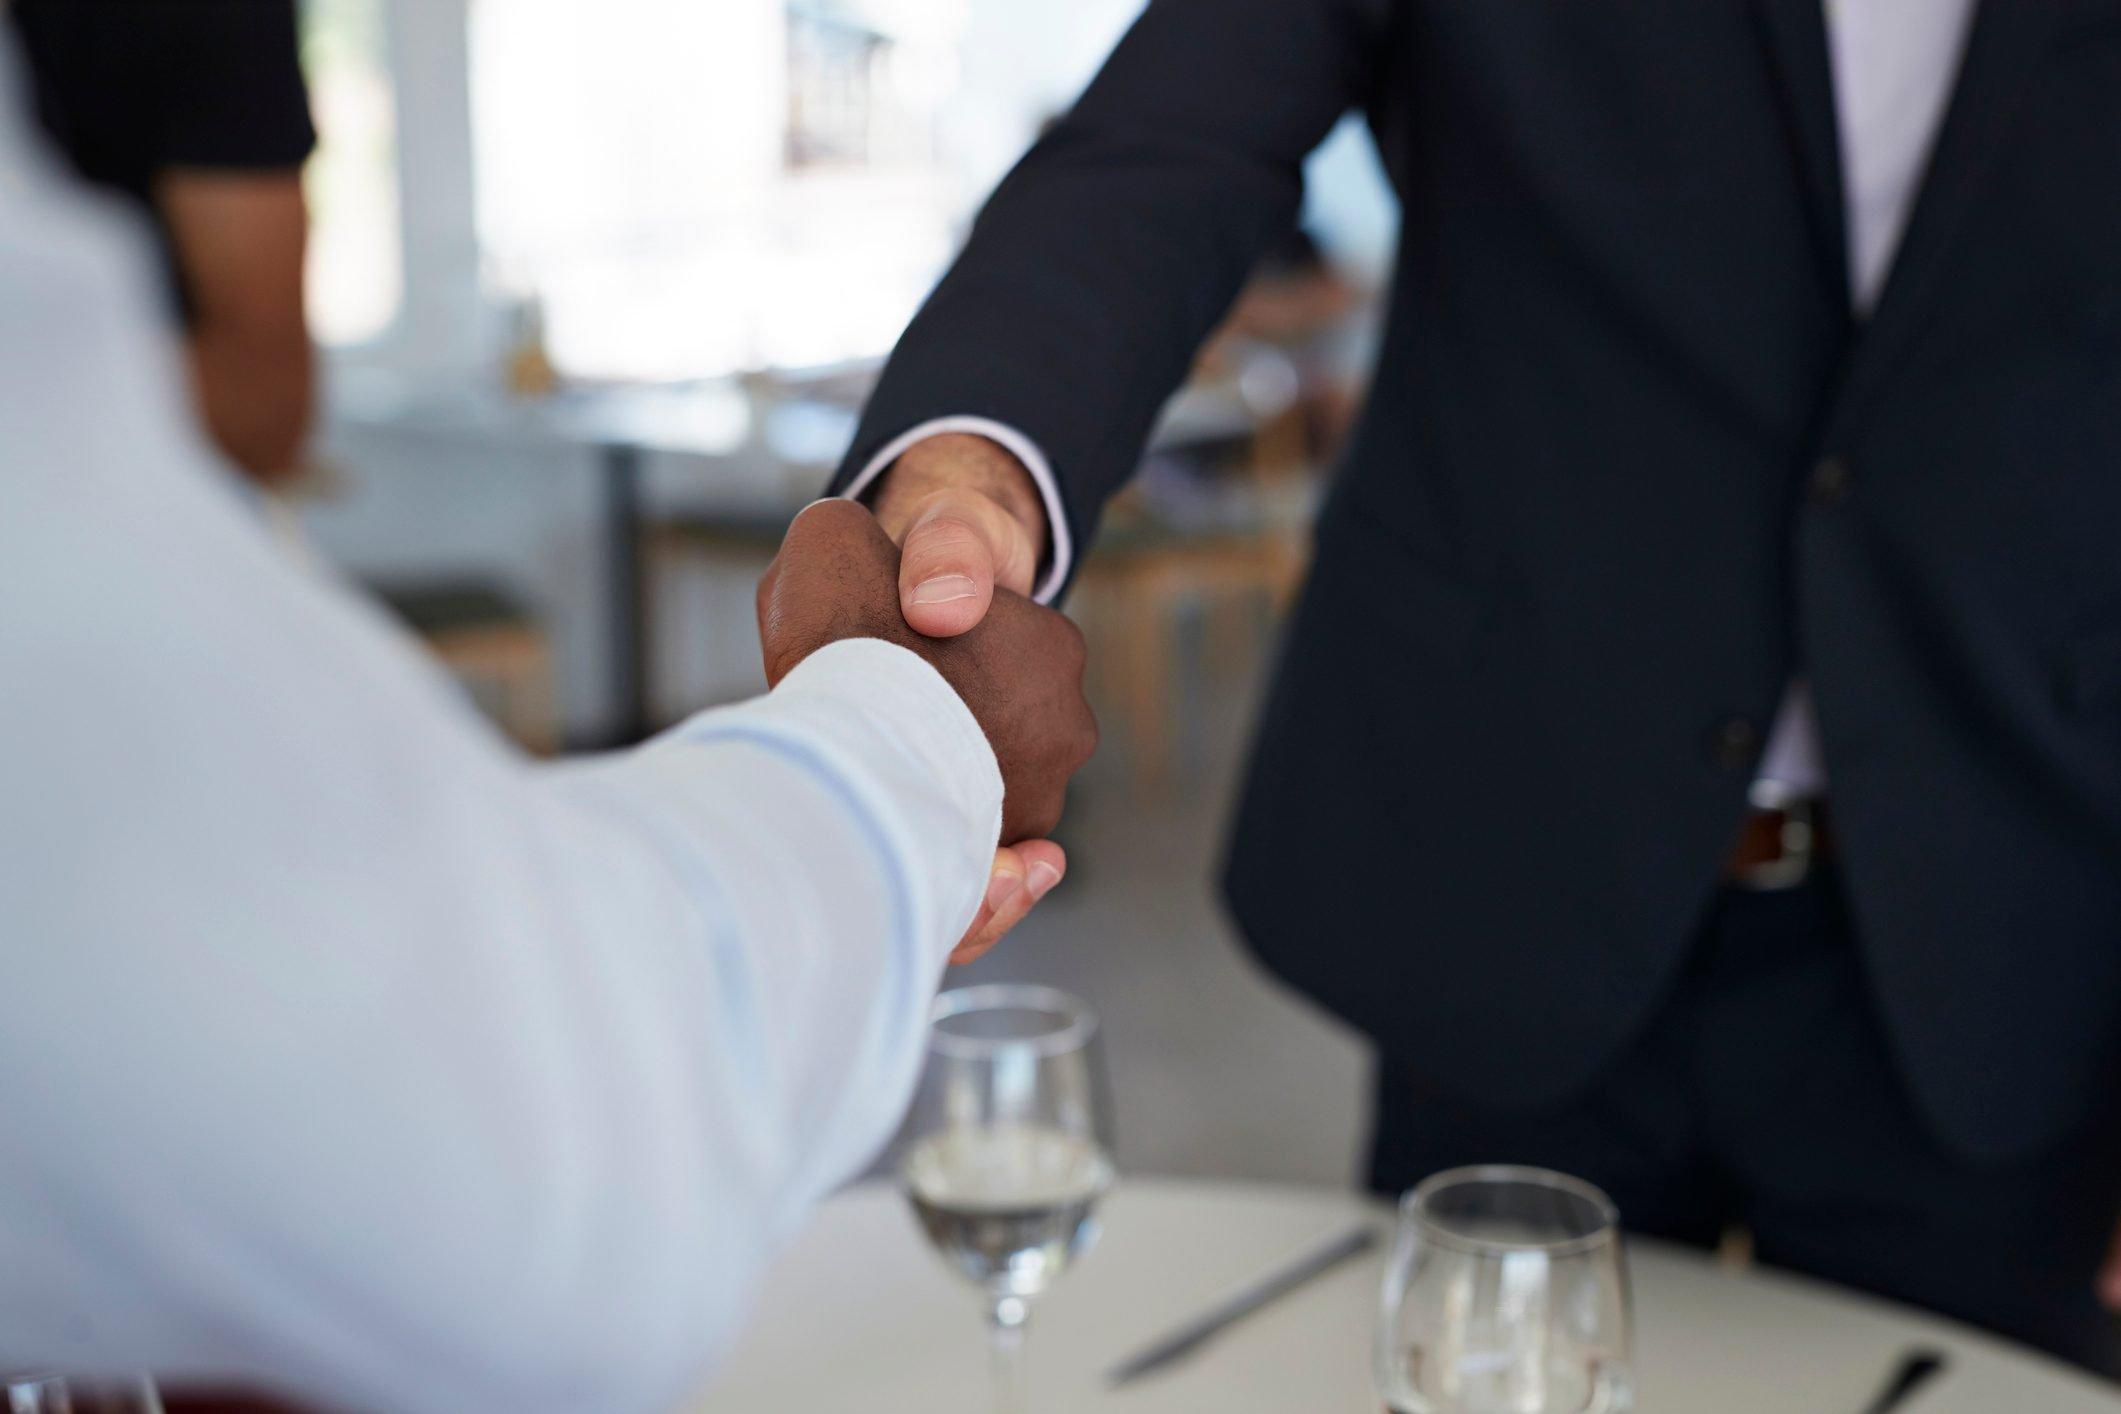 Businesspeople making handshakes, at restaurant